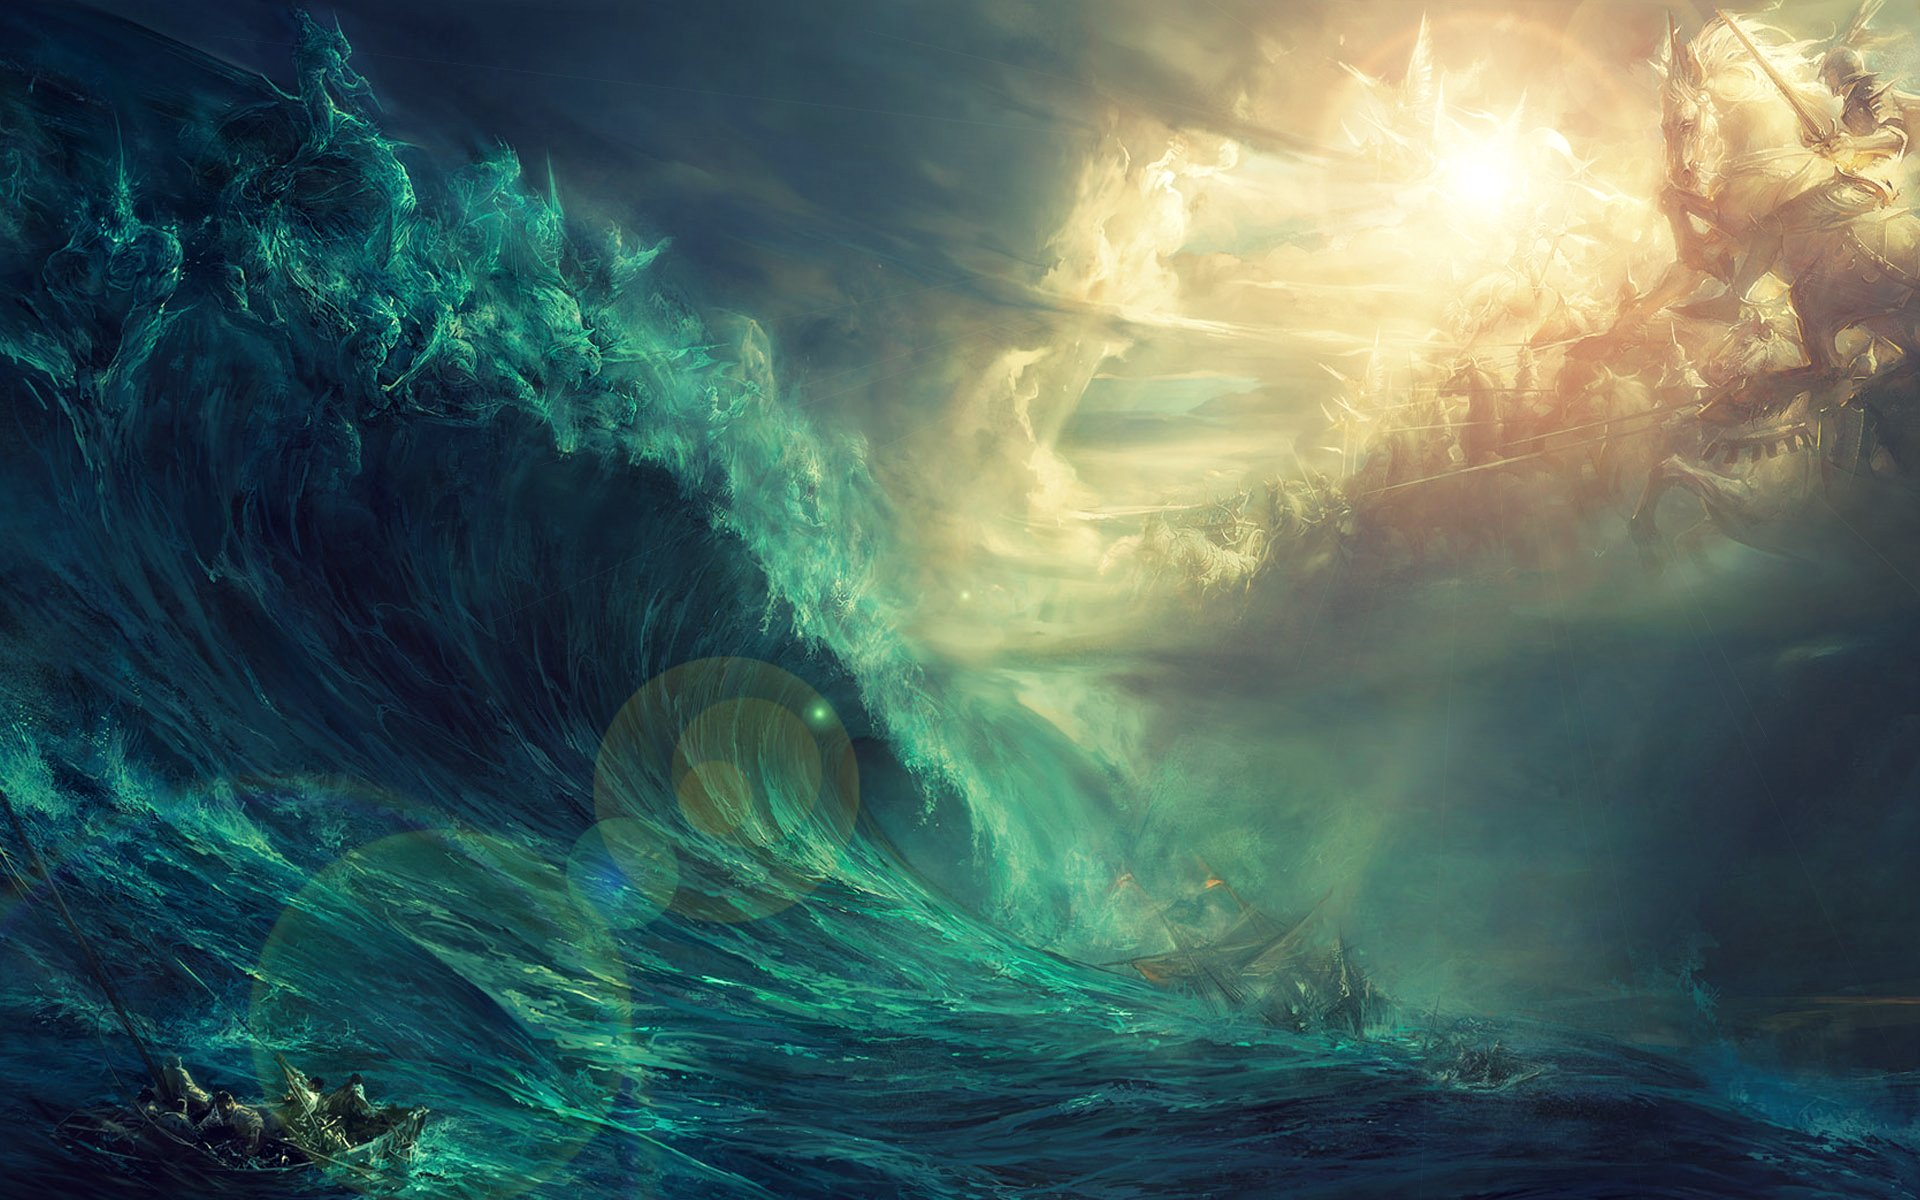 god-war-wallpaper-vehicles-storm-ships-wallpapers-images